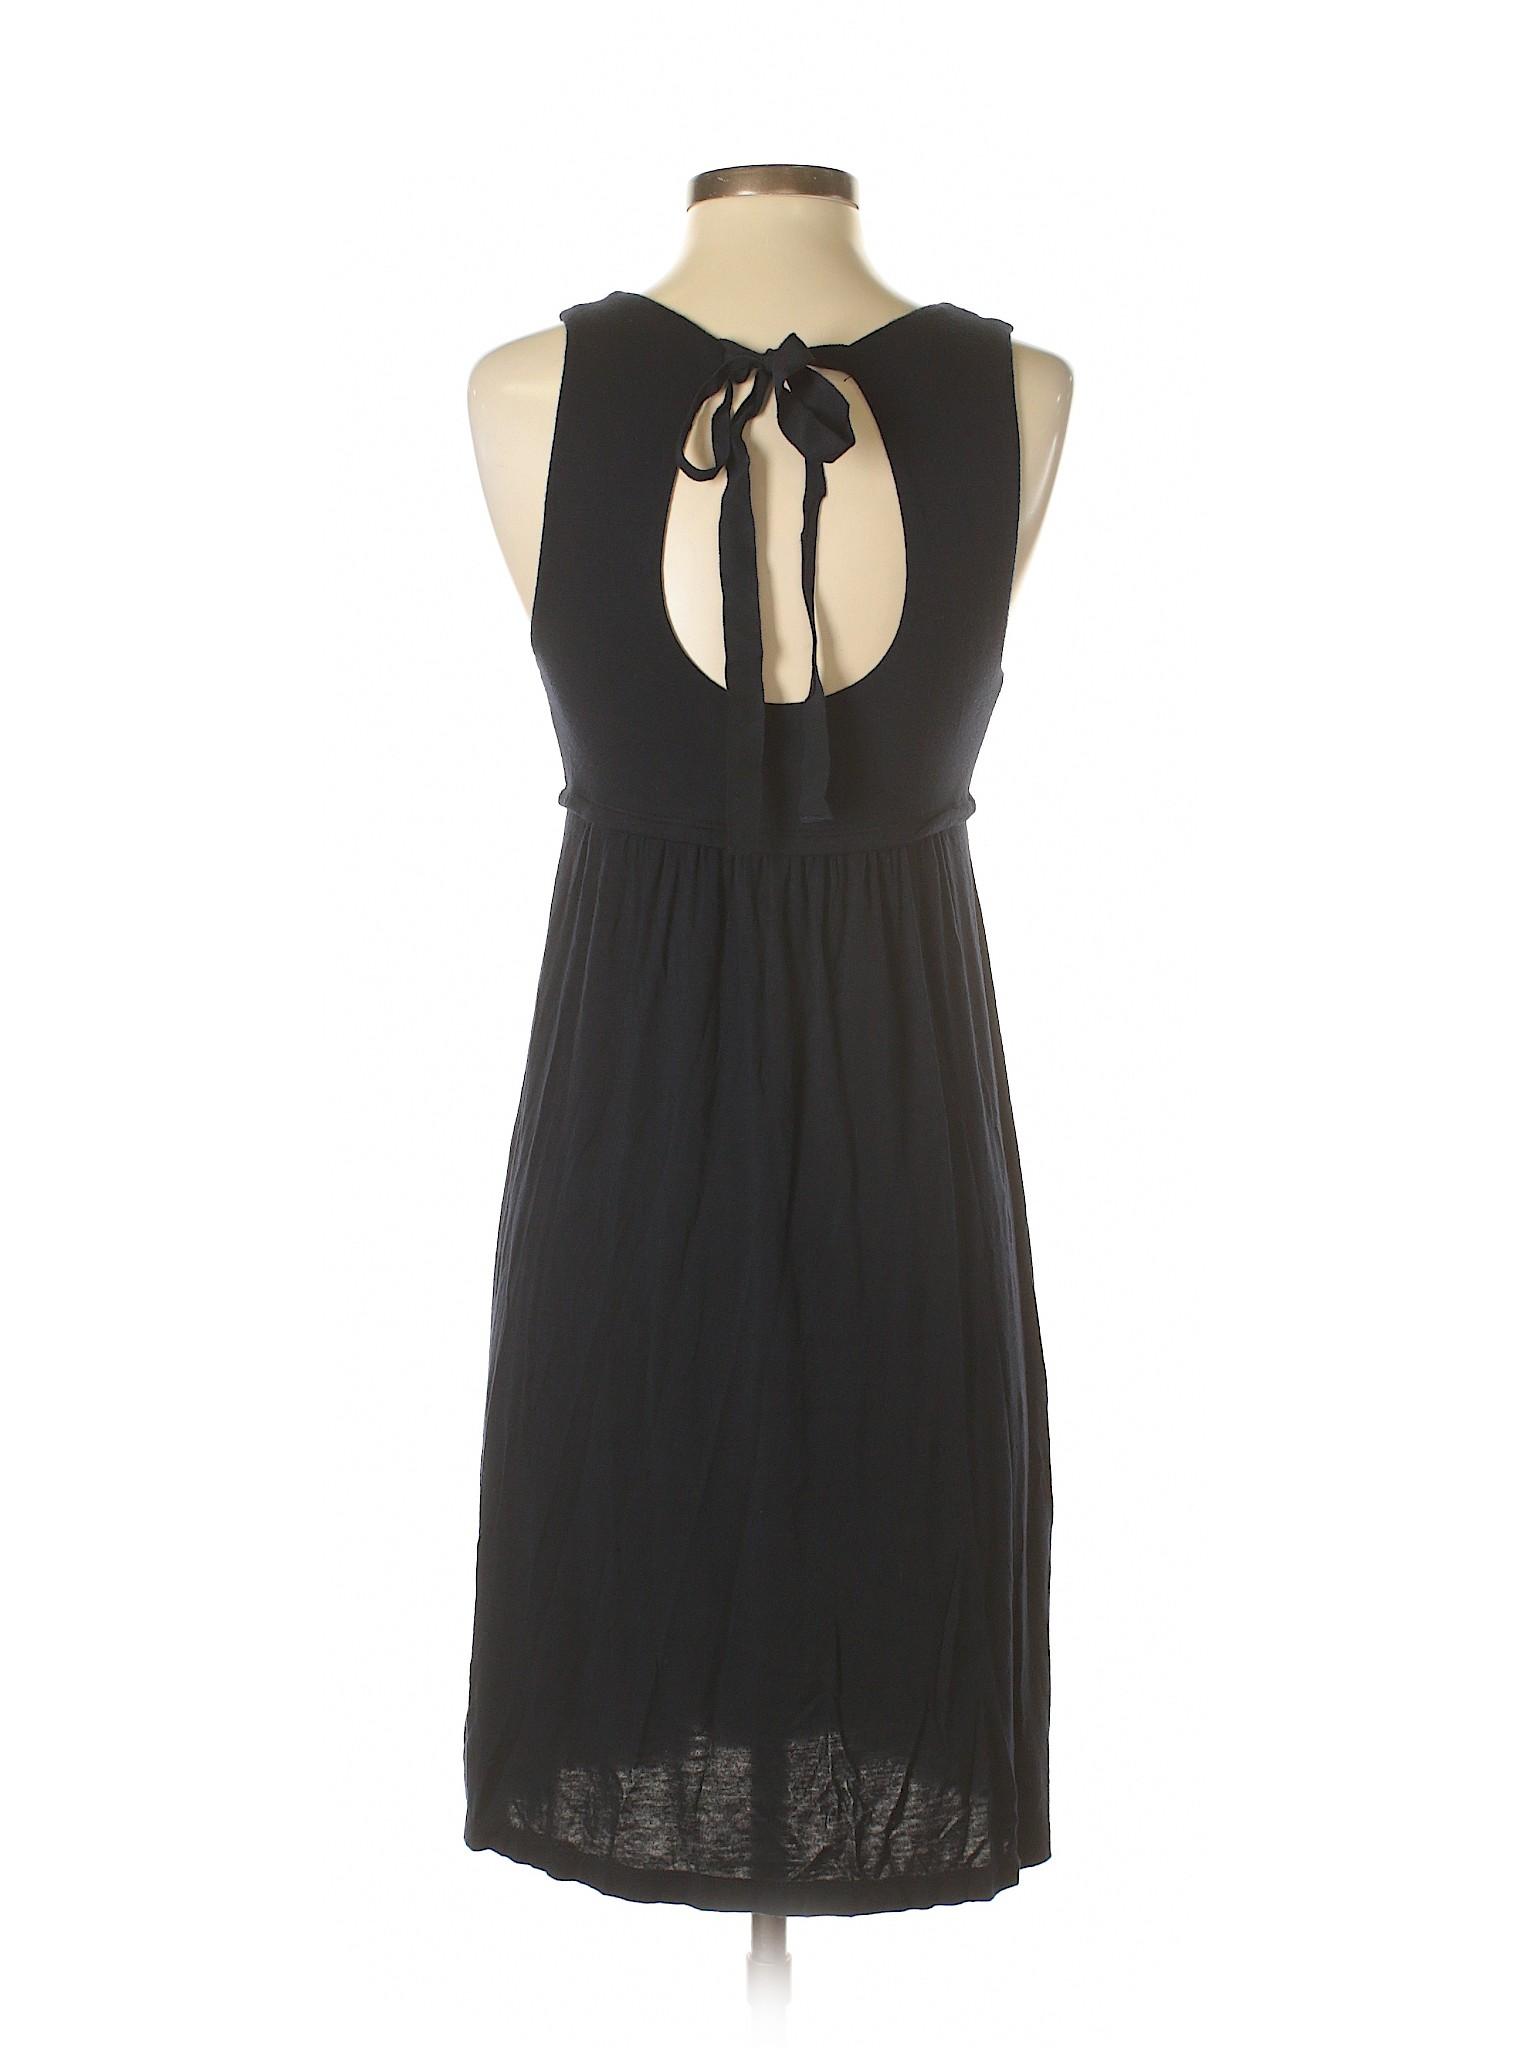 Casual winter LOFT Dress Boutique Taylor Ann w4I77q